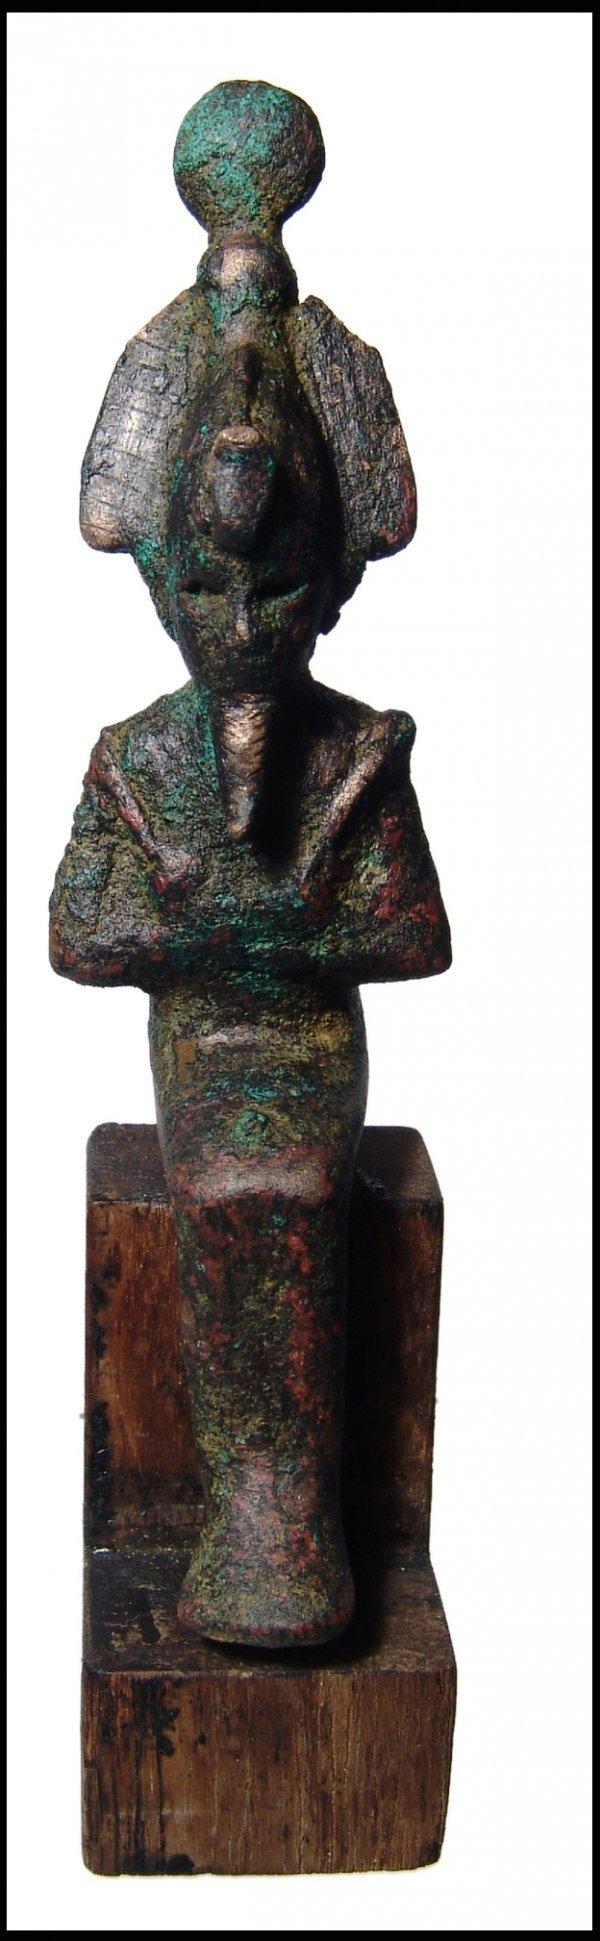 5: Ancient Egypt. Seated bronze figure of Osiris